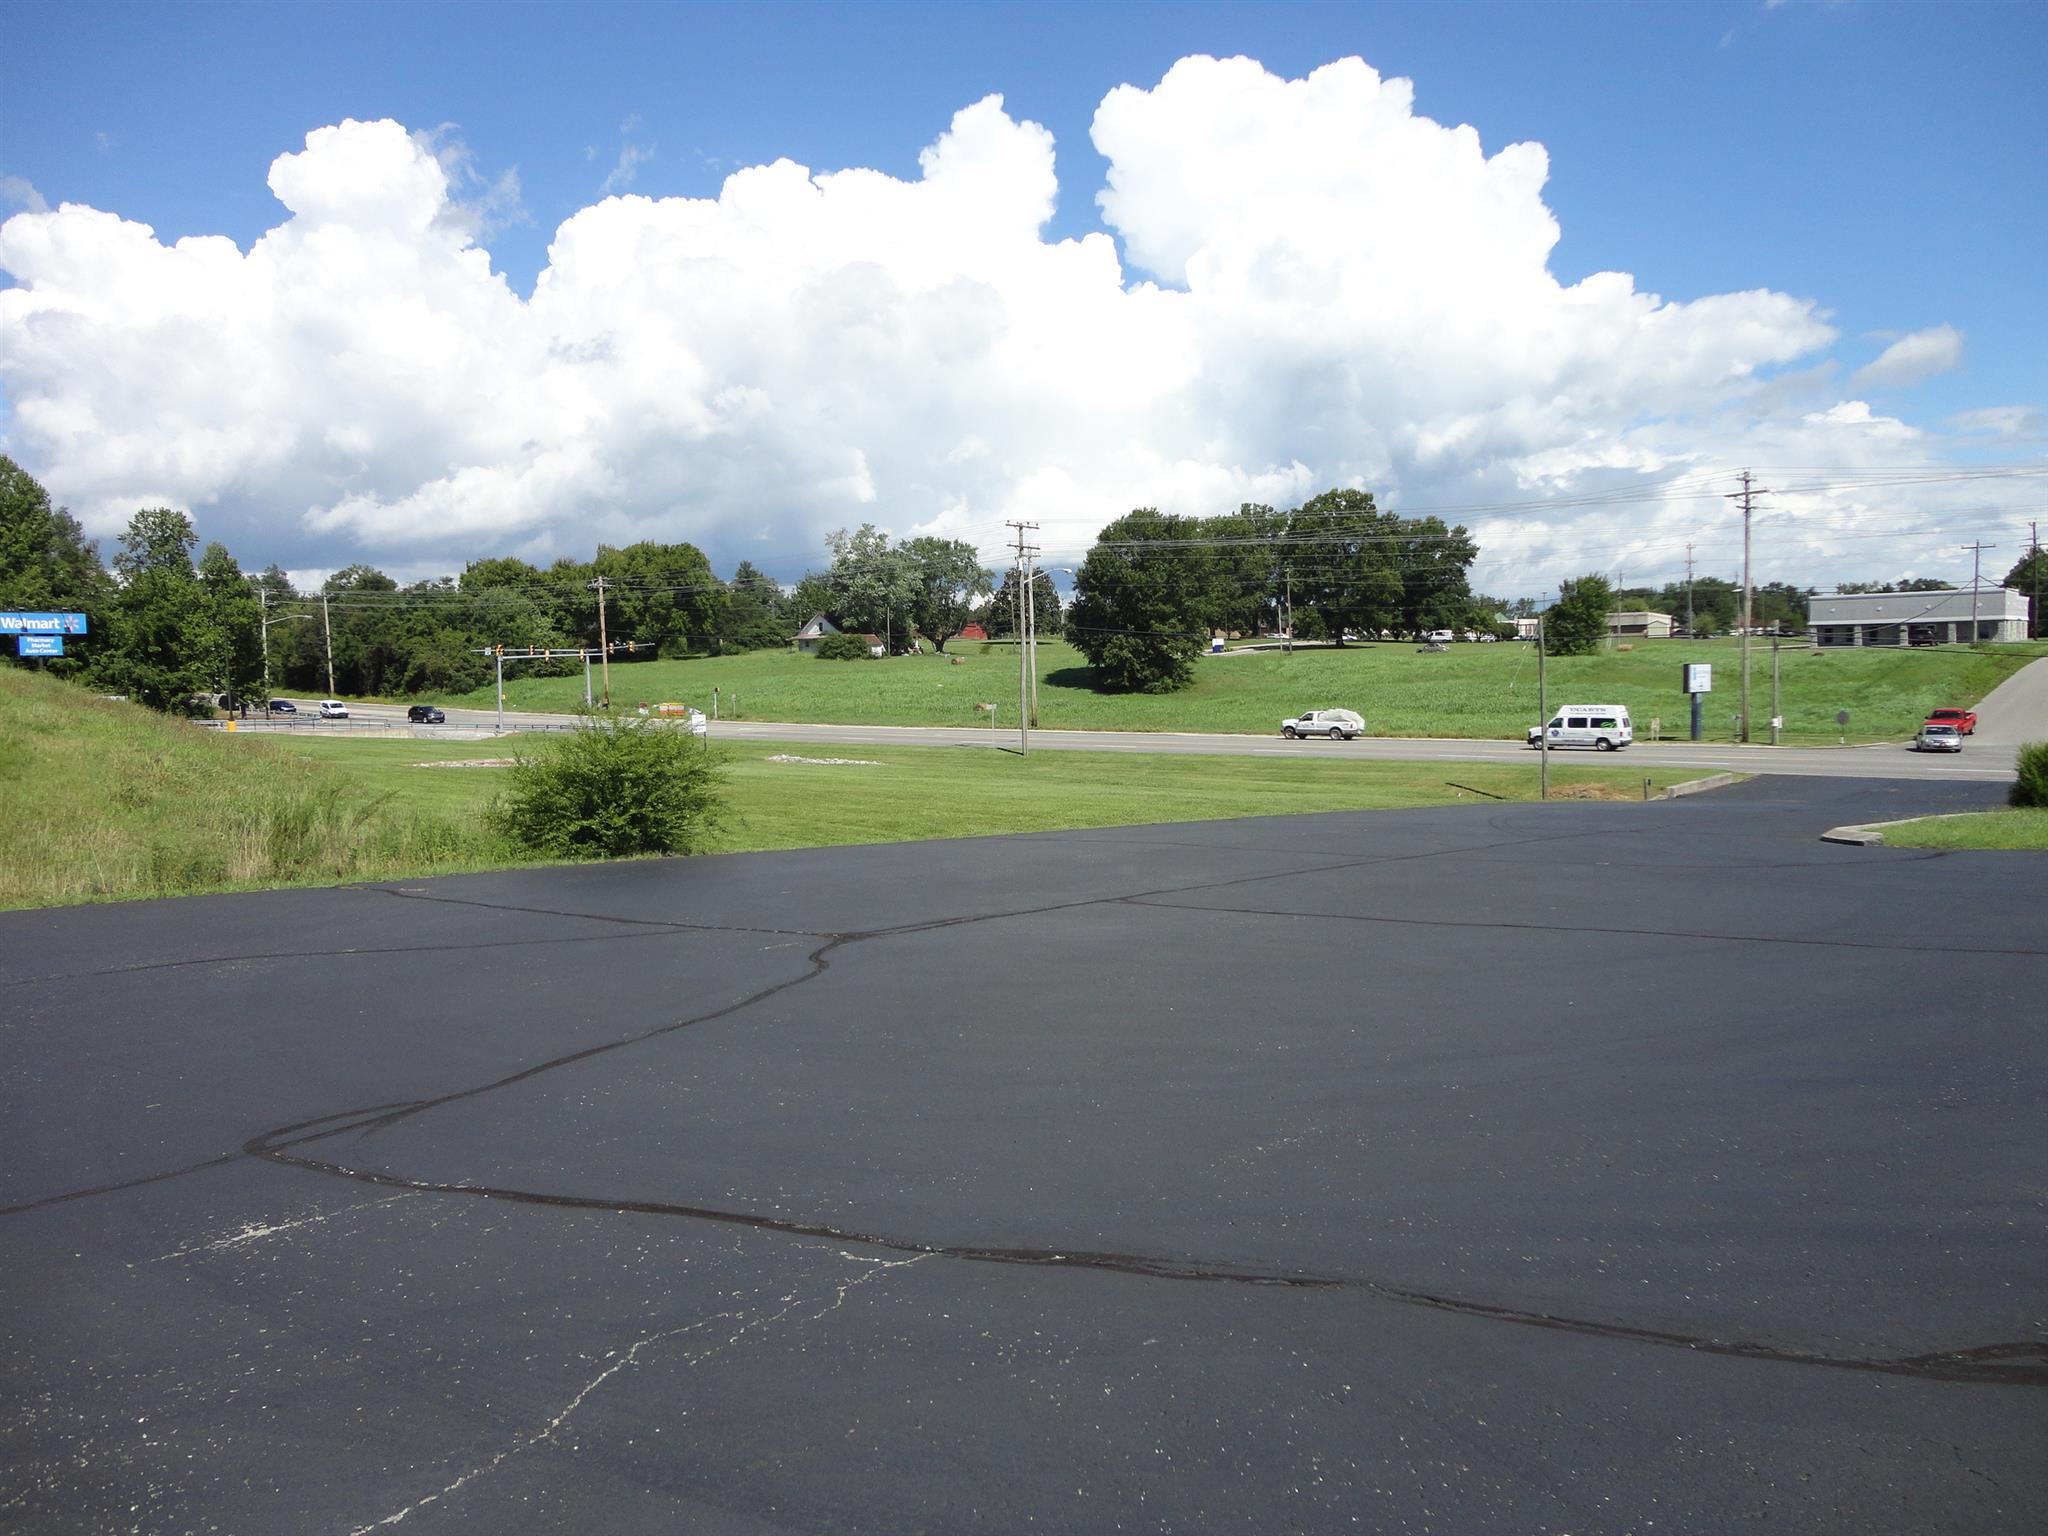 0 Hwy 70/W. Broad St., Smithville, TN 37166